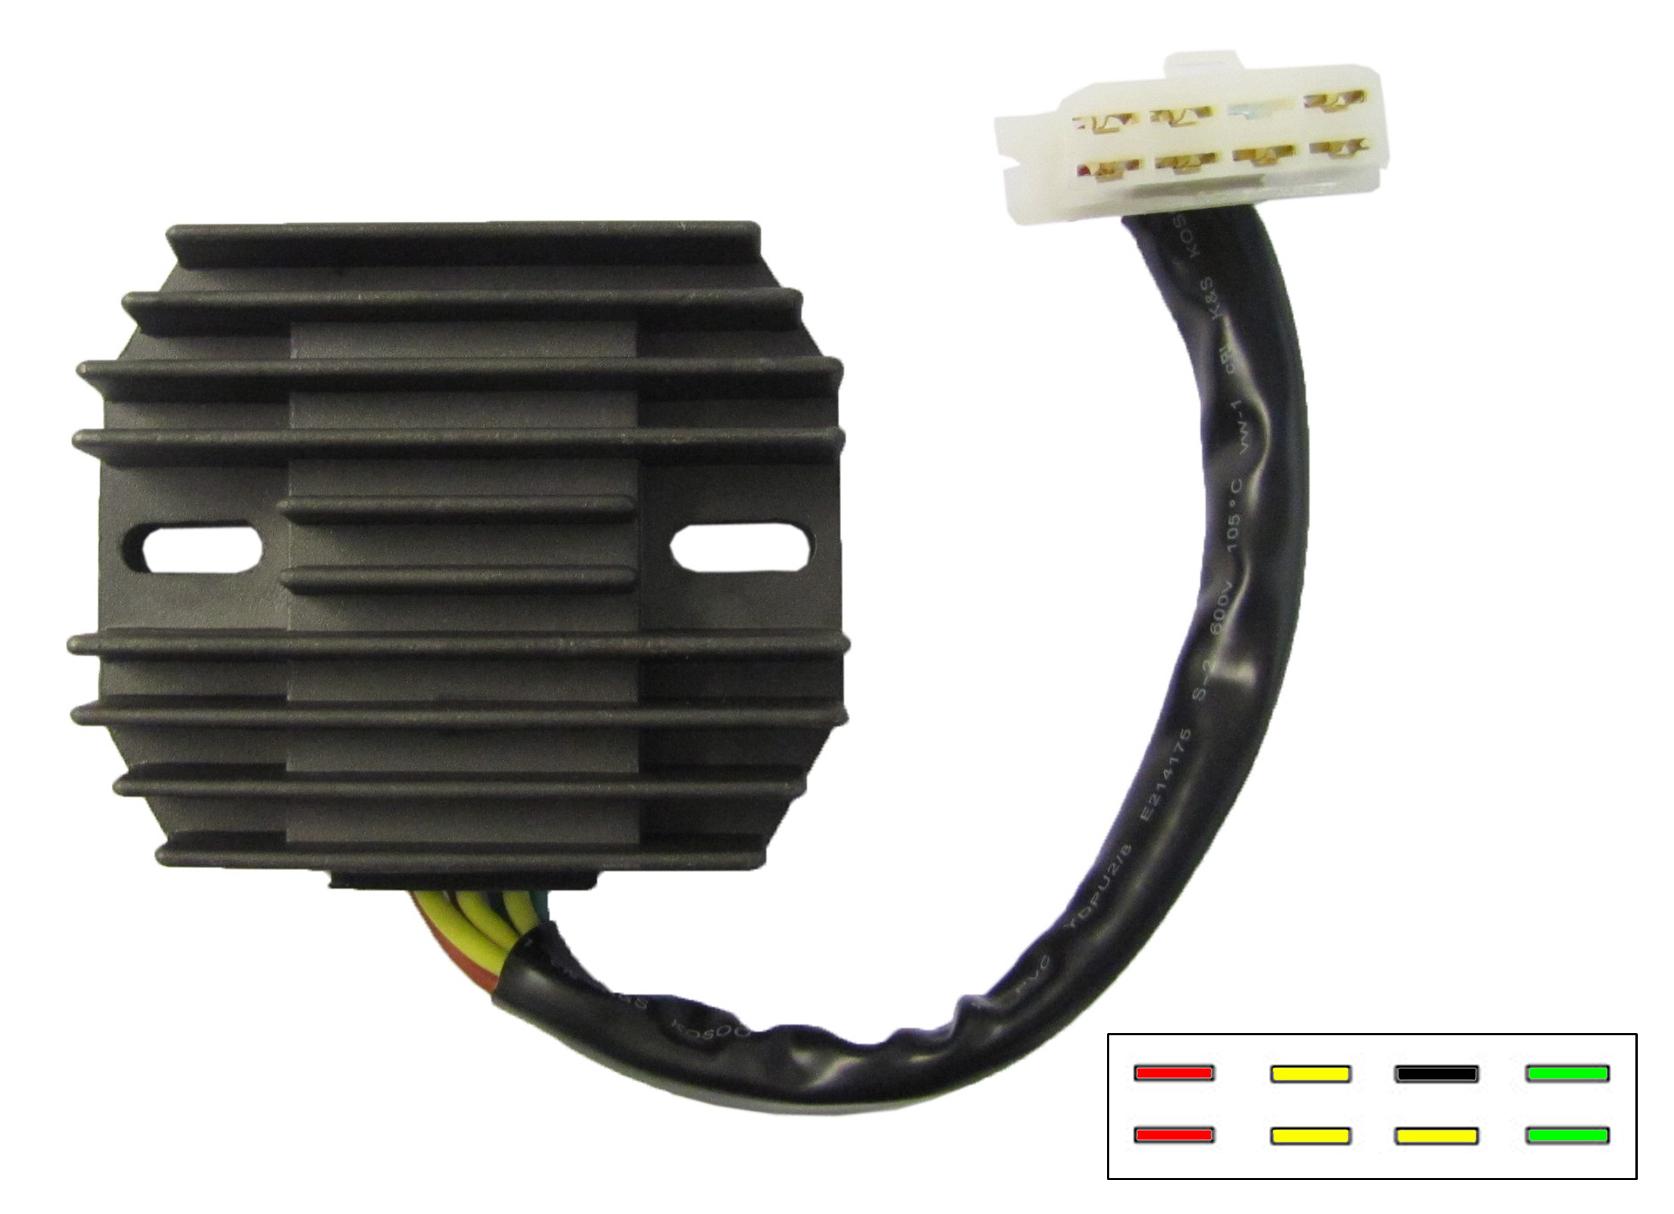 hight resolution of regulator rectifier fits honda gl1100 gl1200 7 wires sh541c 12 each